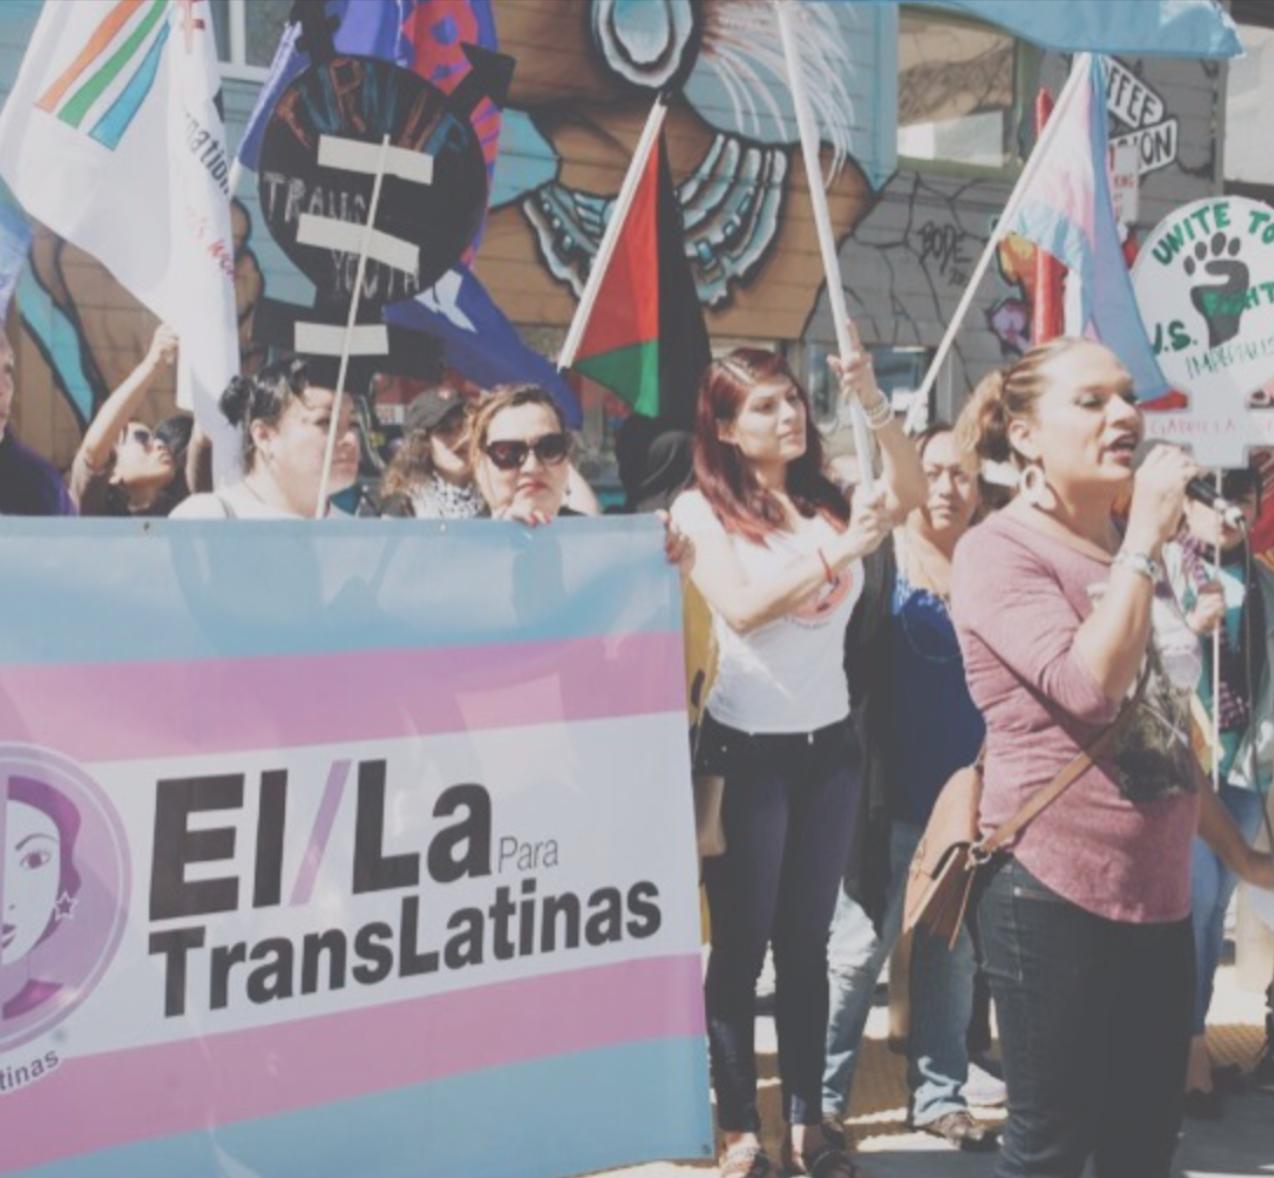 El/la para translatinas - San Francisco, CaliforniaSeptember 2019